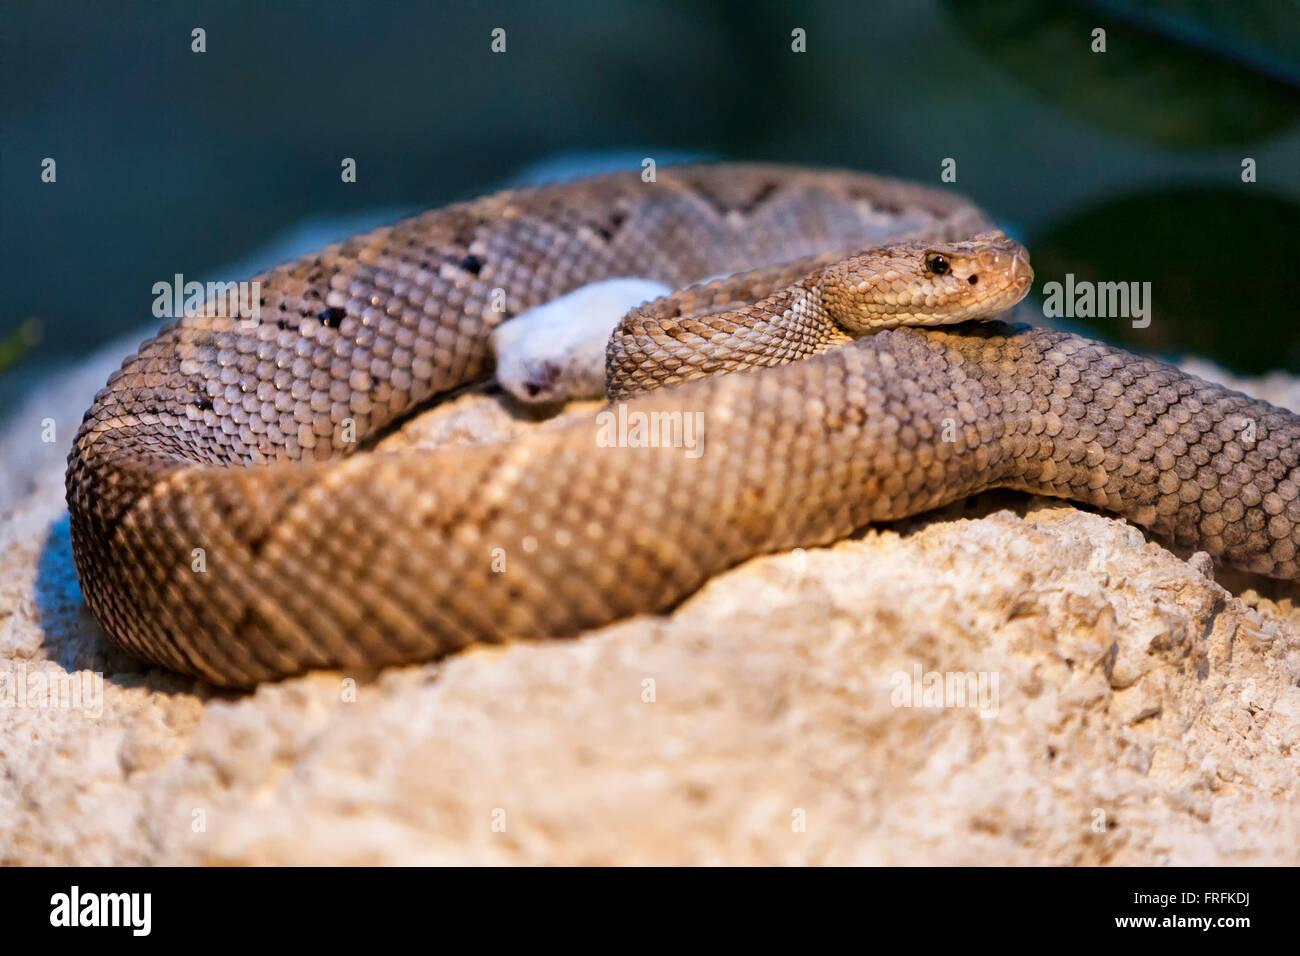 unknown-snake-FRFKDJ.jpg